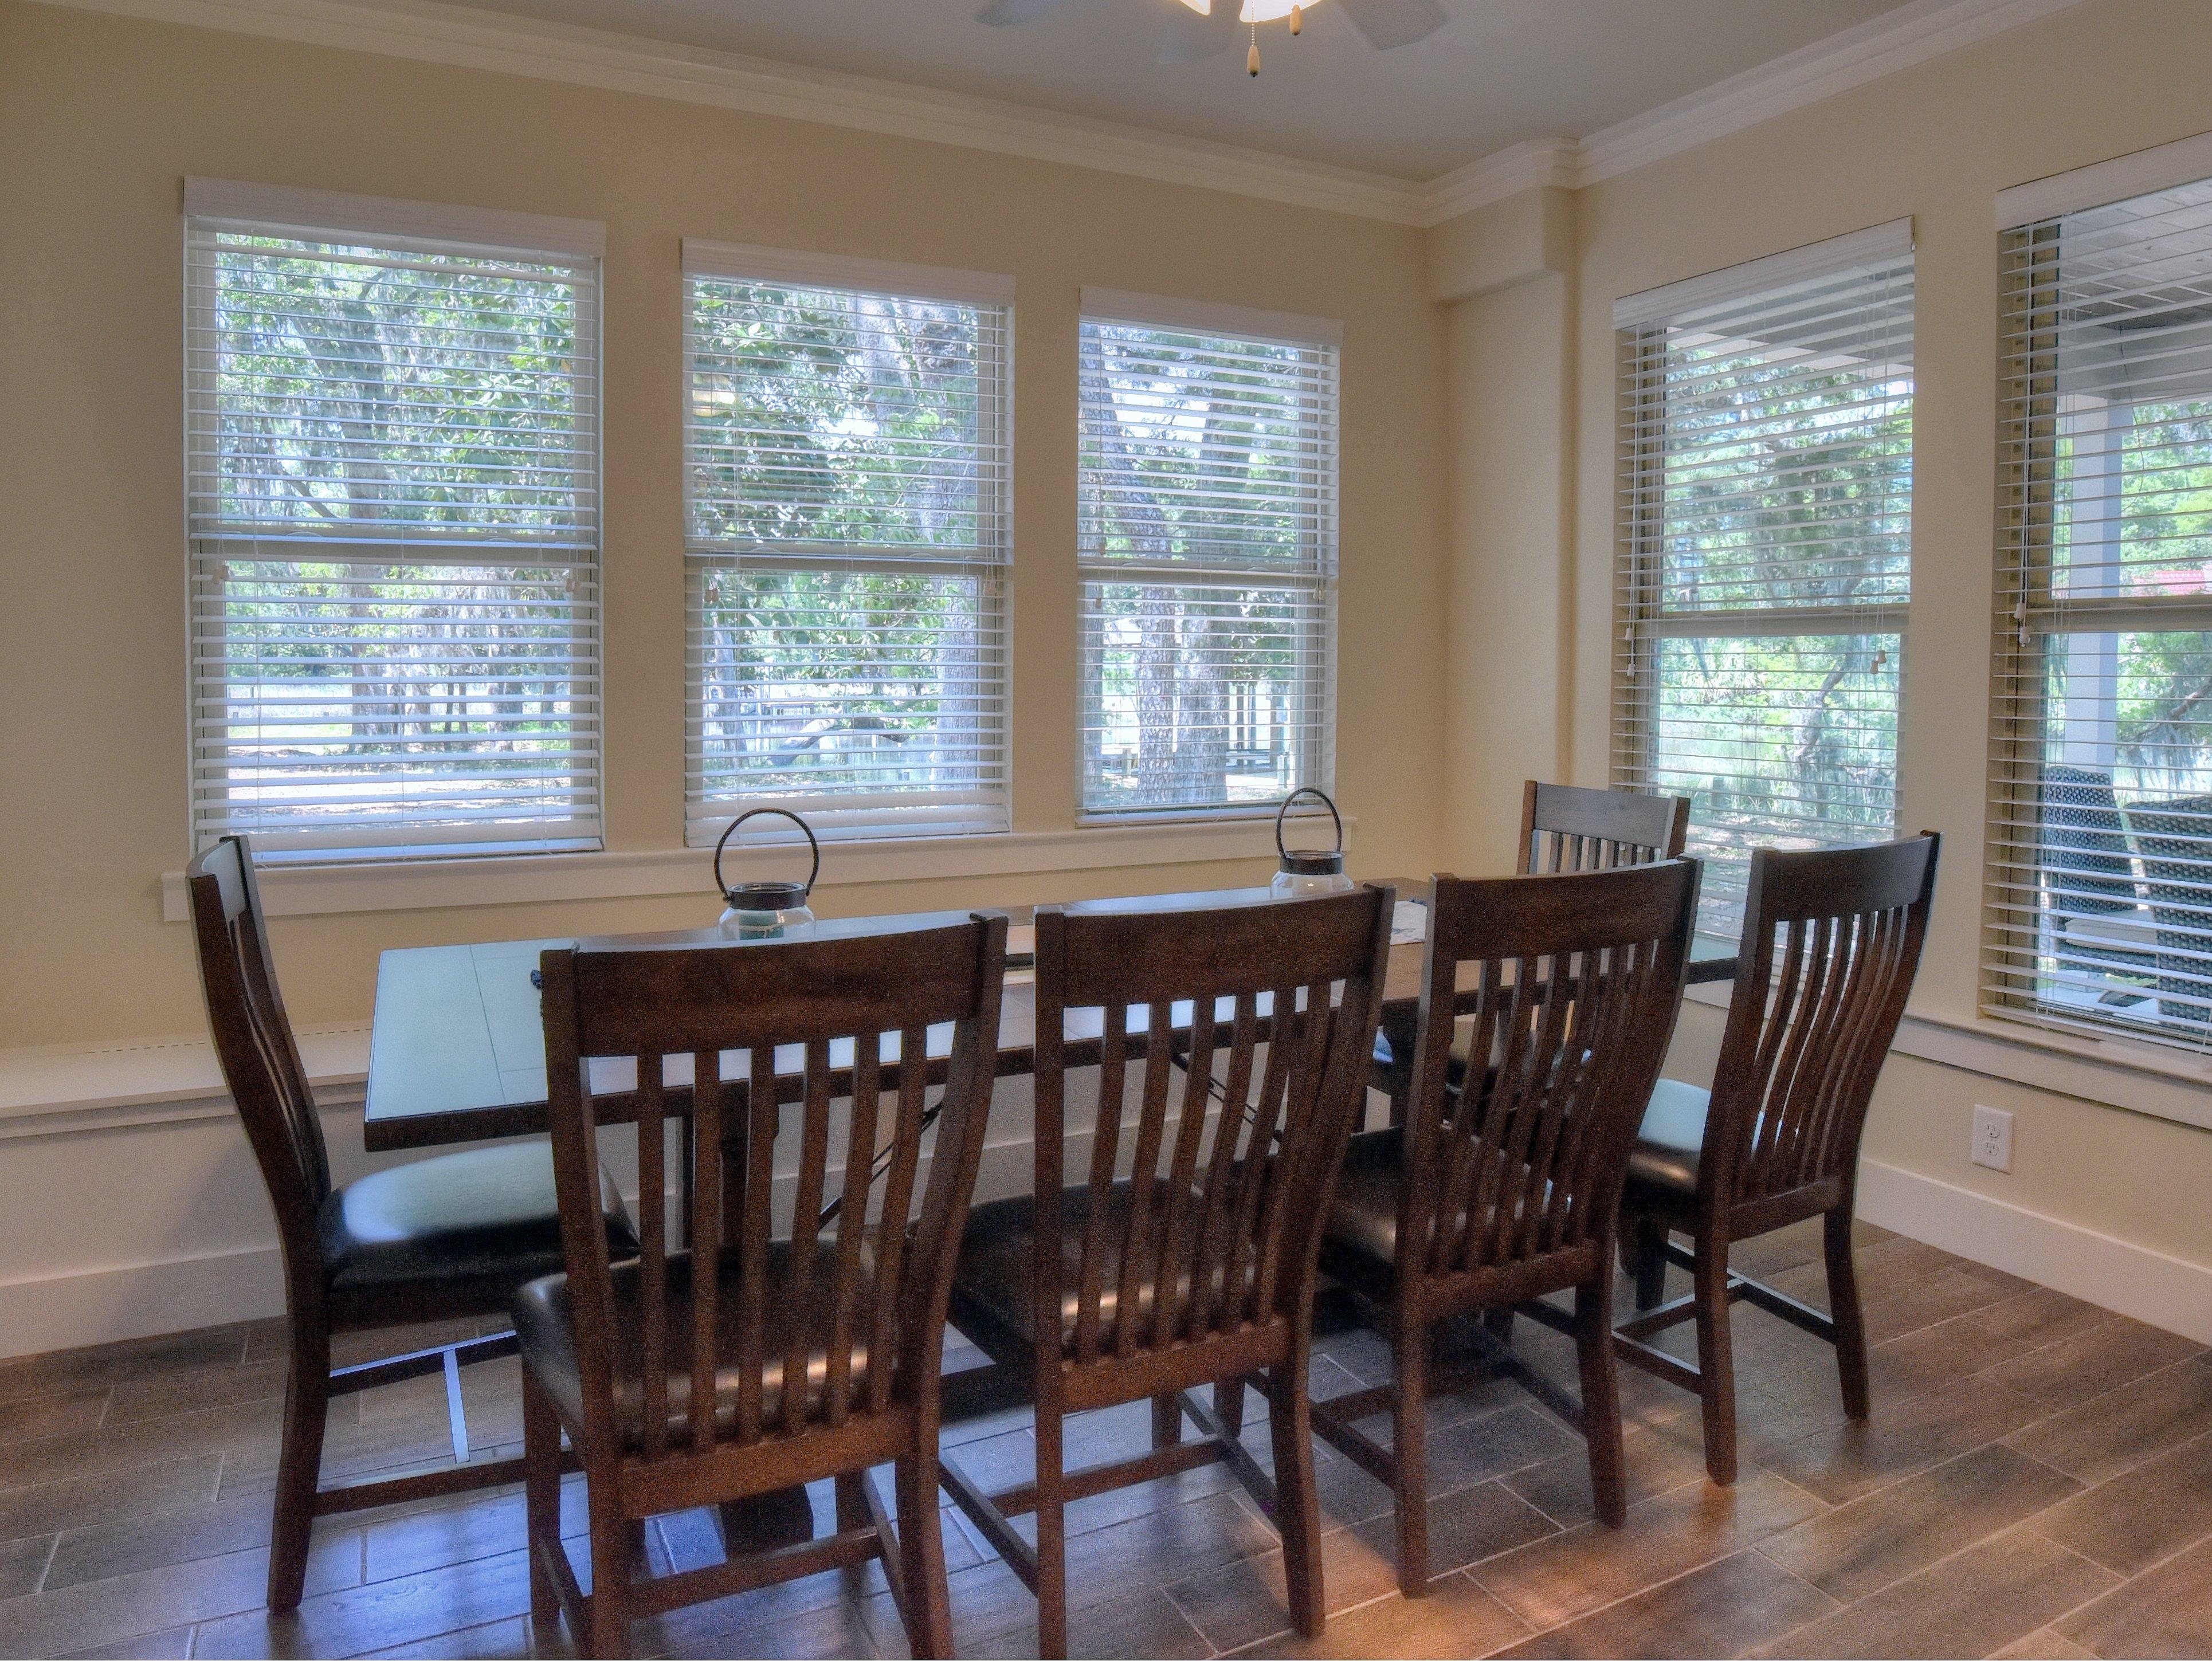 93 Beacon Point Condo rental in Sandestin Rentals ~ Cottages and Villas  in Destin Florida - #12